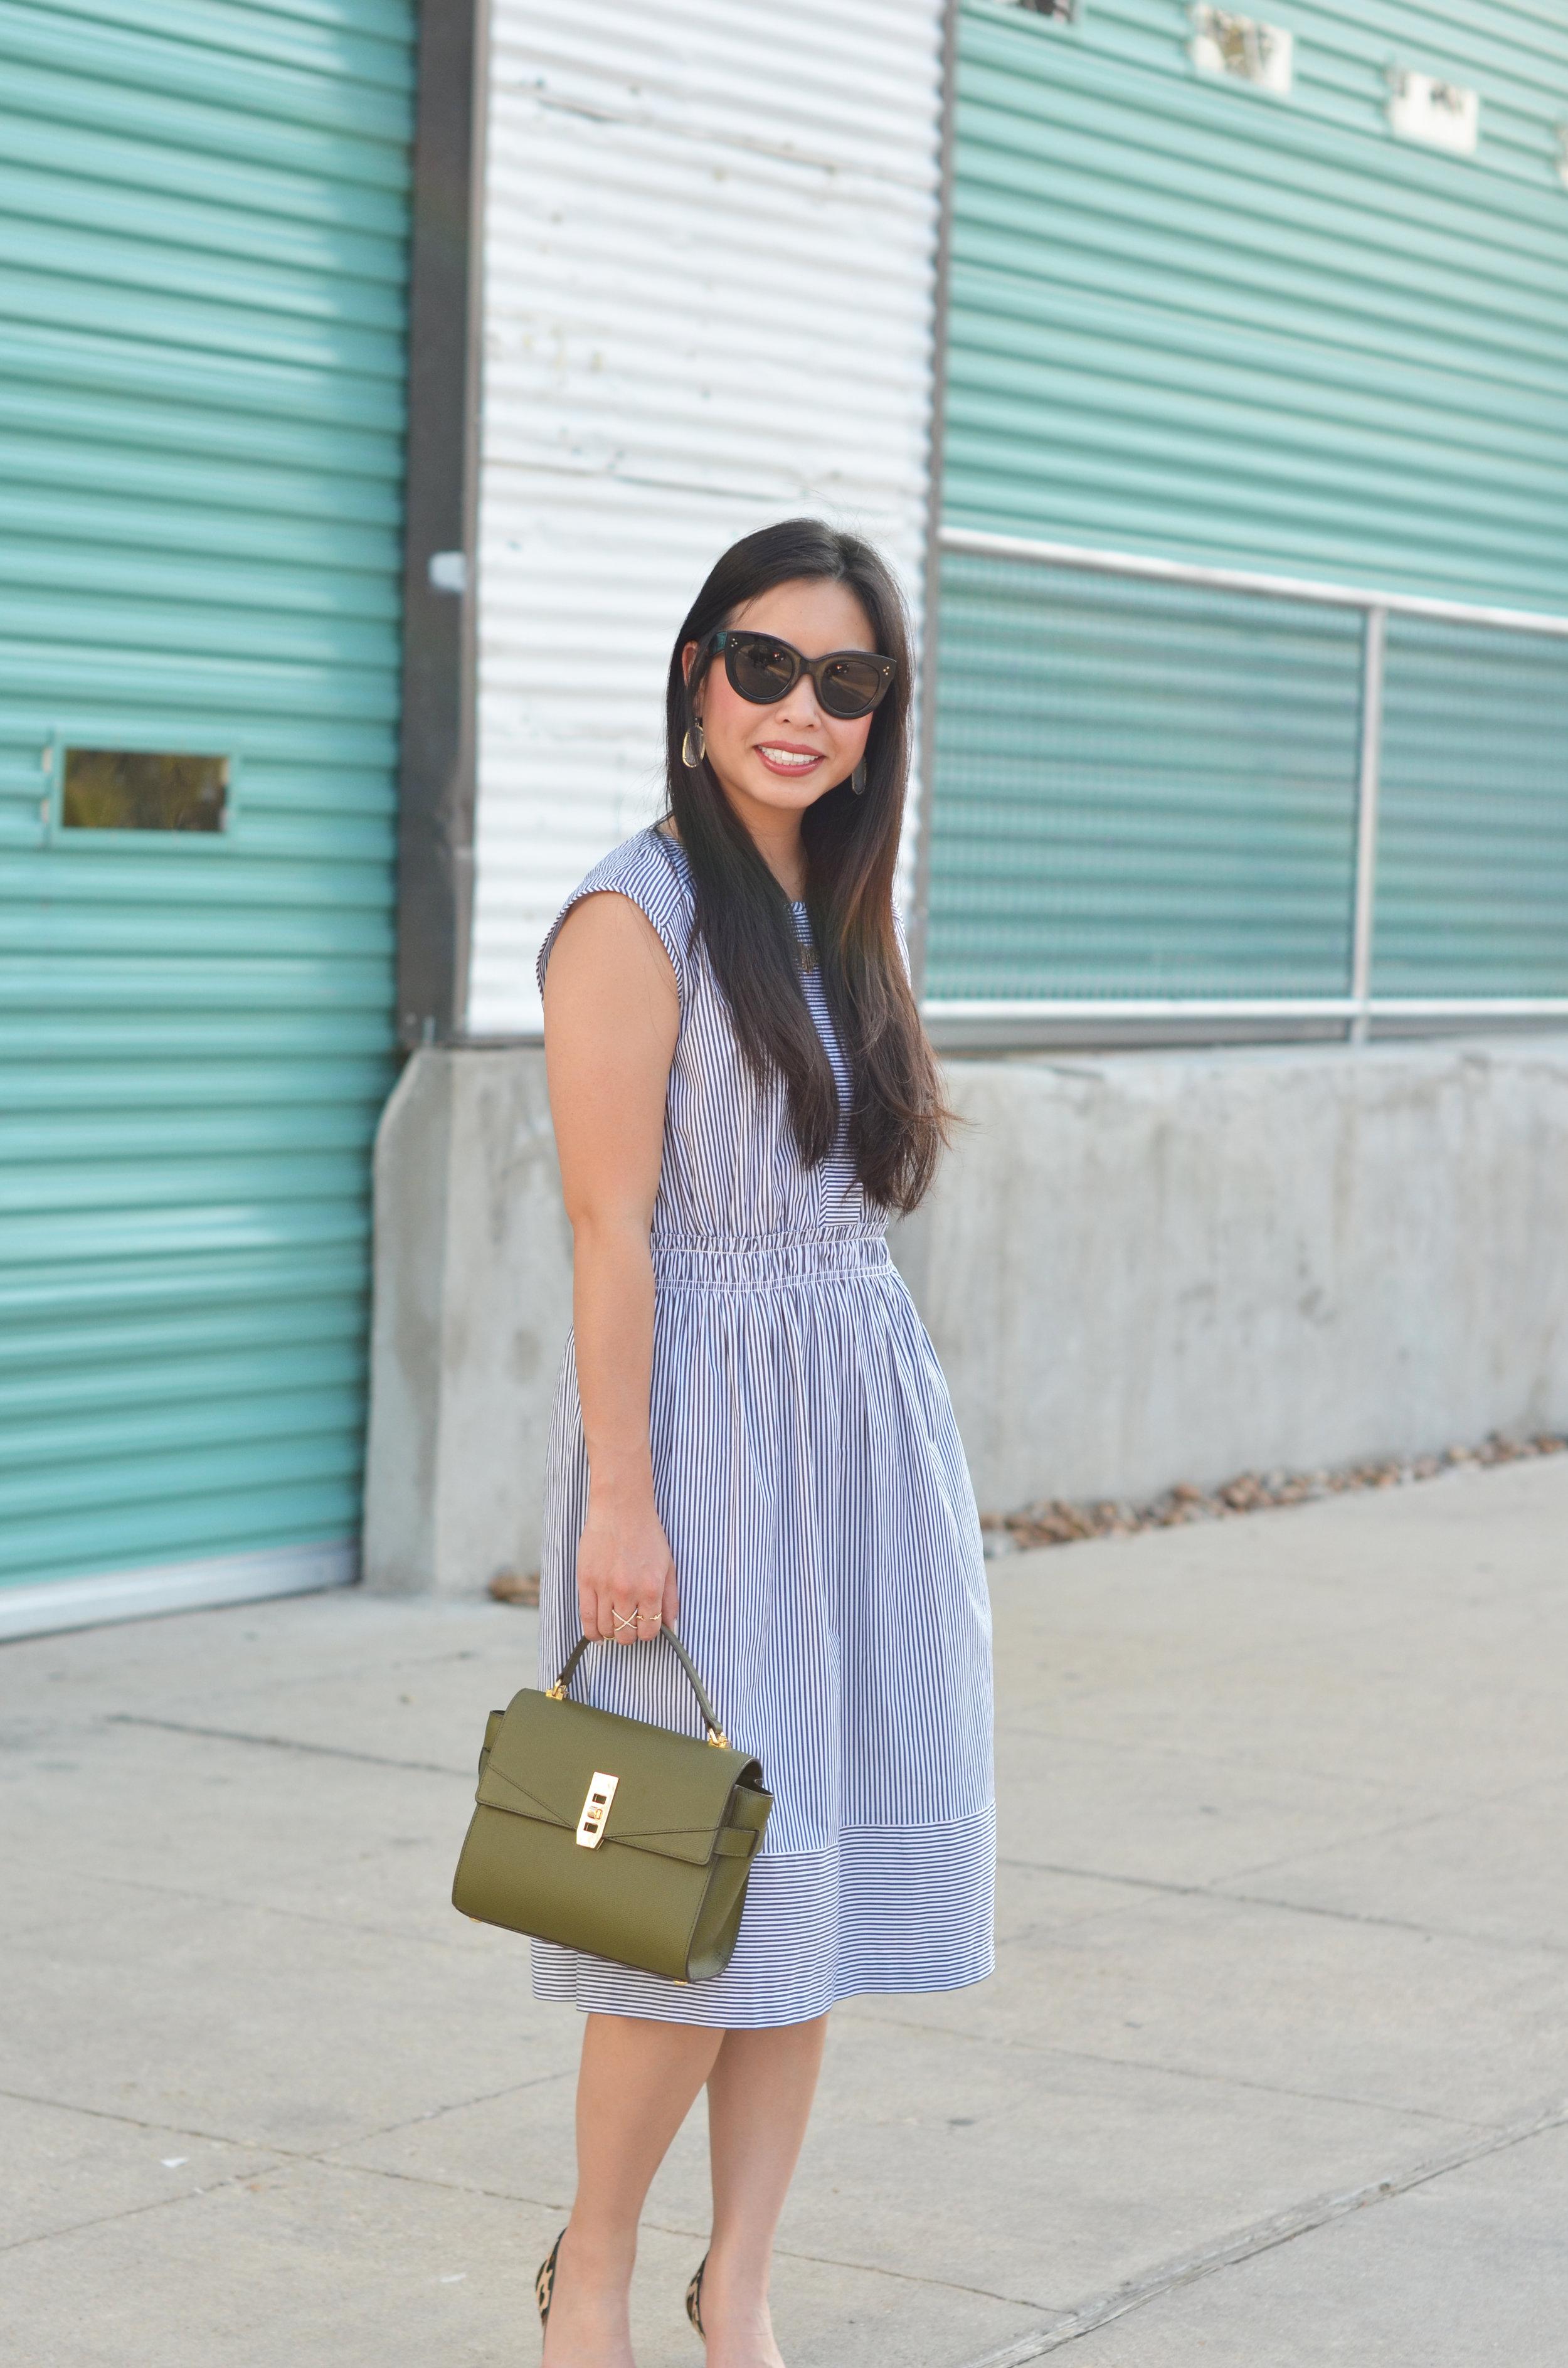 the-striped-dress-olive-handbag-jannadoan.com